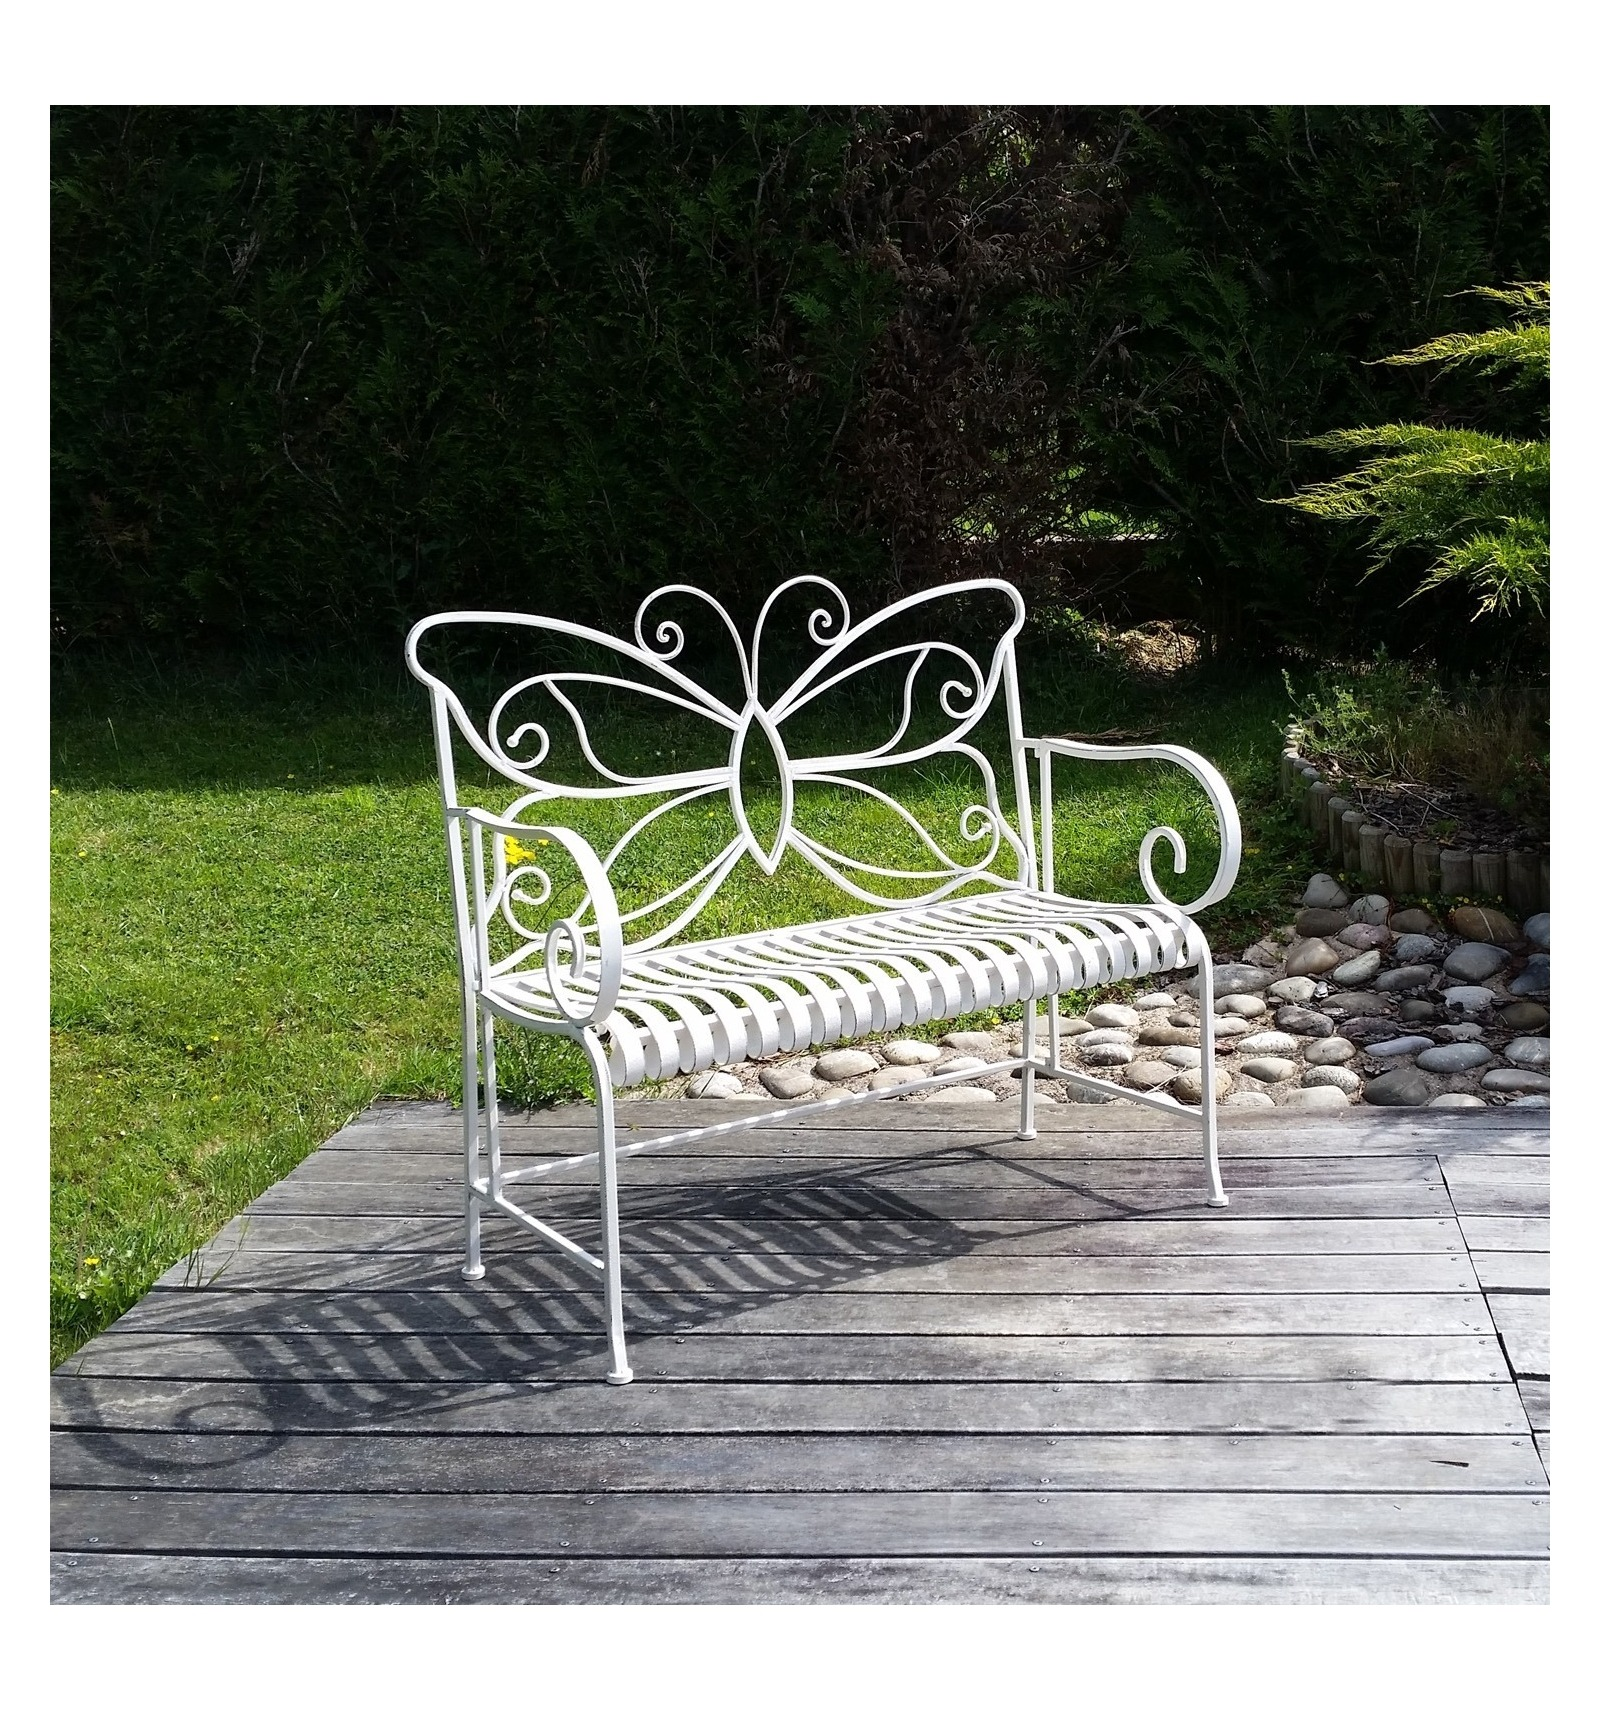 Banc de jardin en fer forg blanc salon de jardin en fer forg - Banc de jardin blanc ...